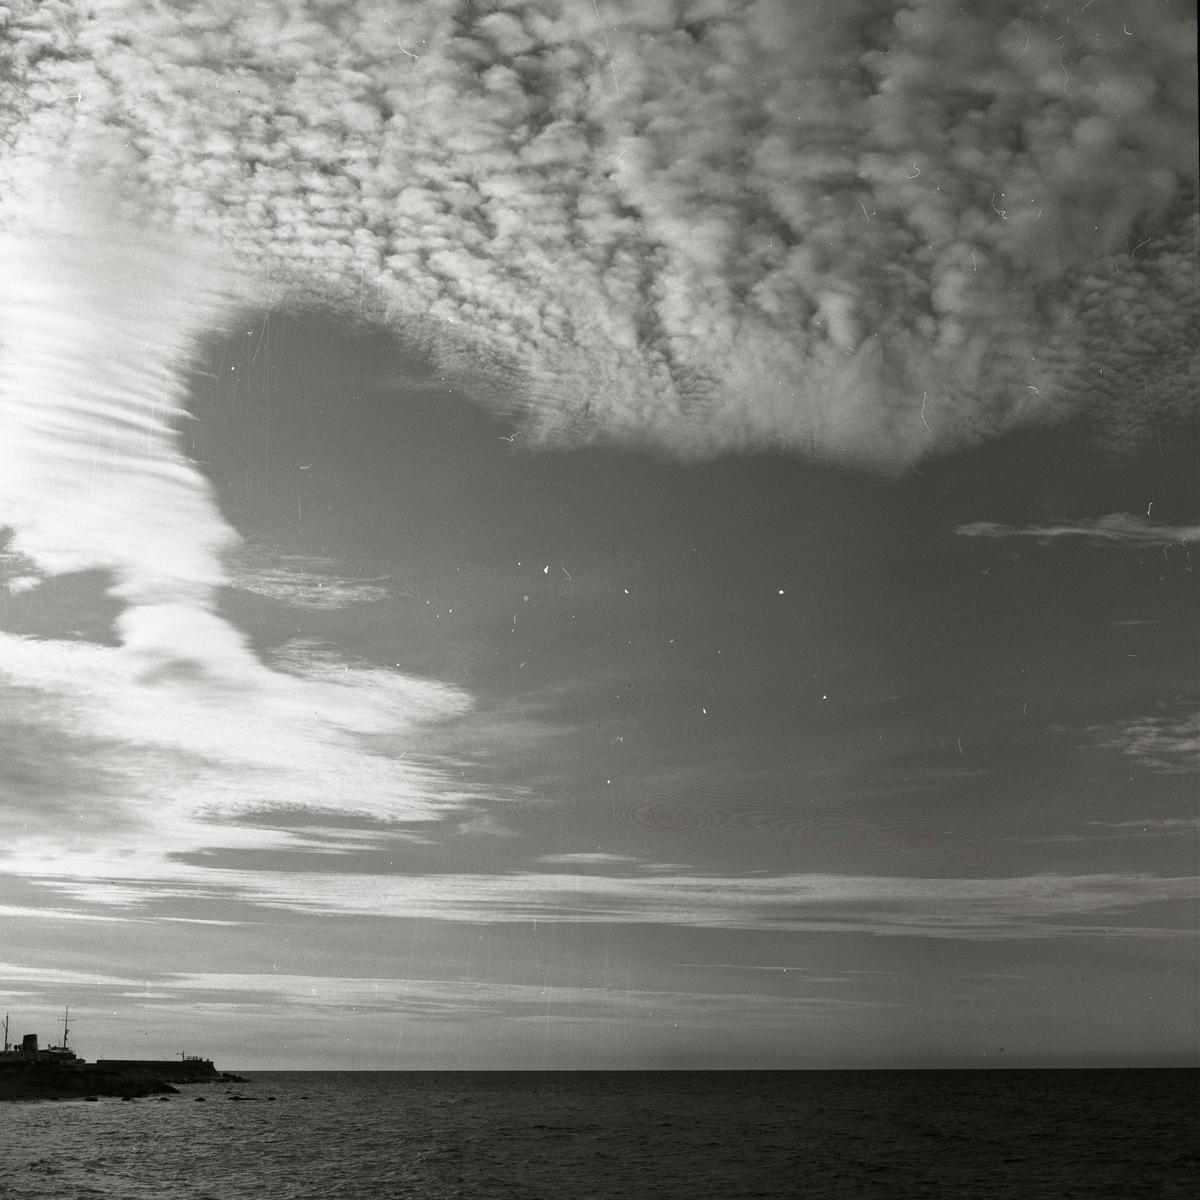 En molnig himmel över havet vid Visby den 22 november 1955.